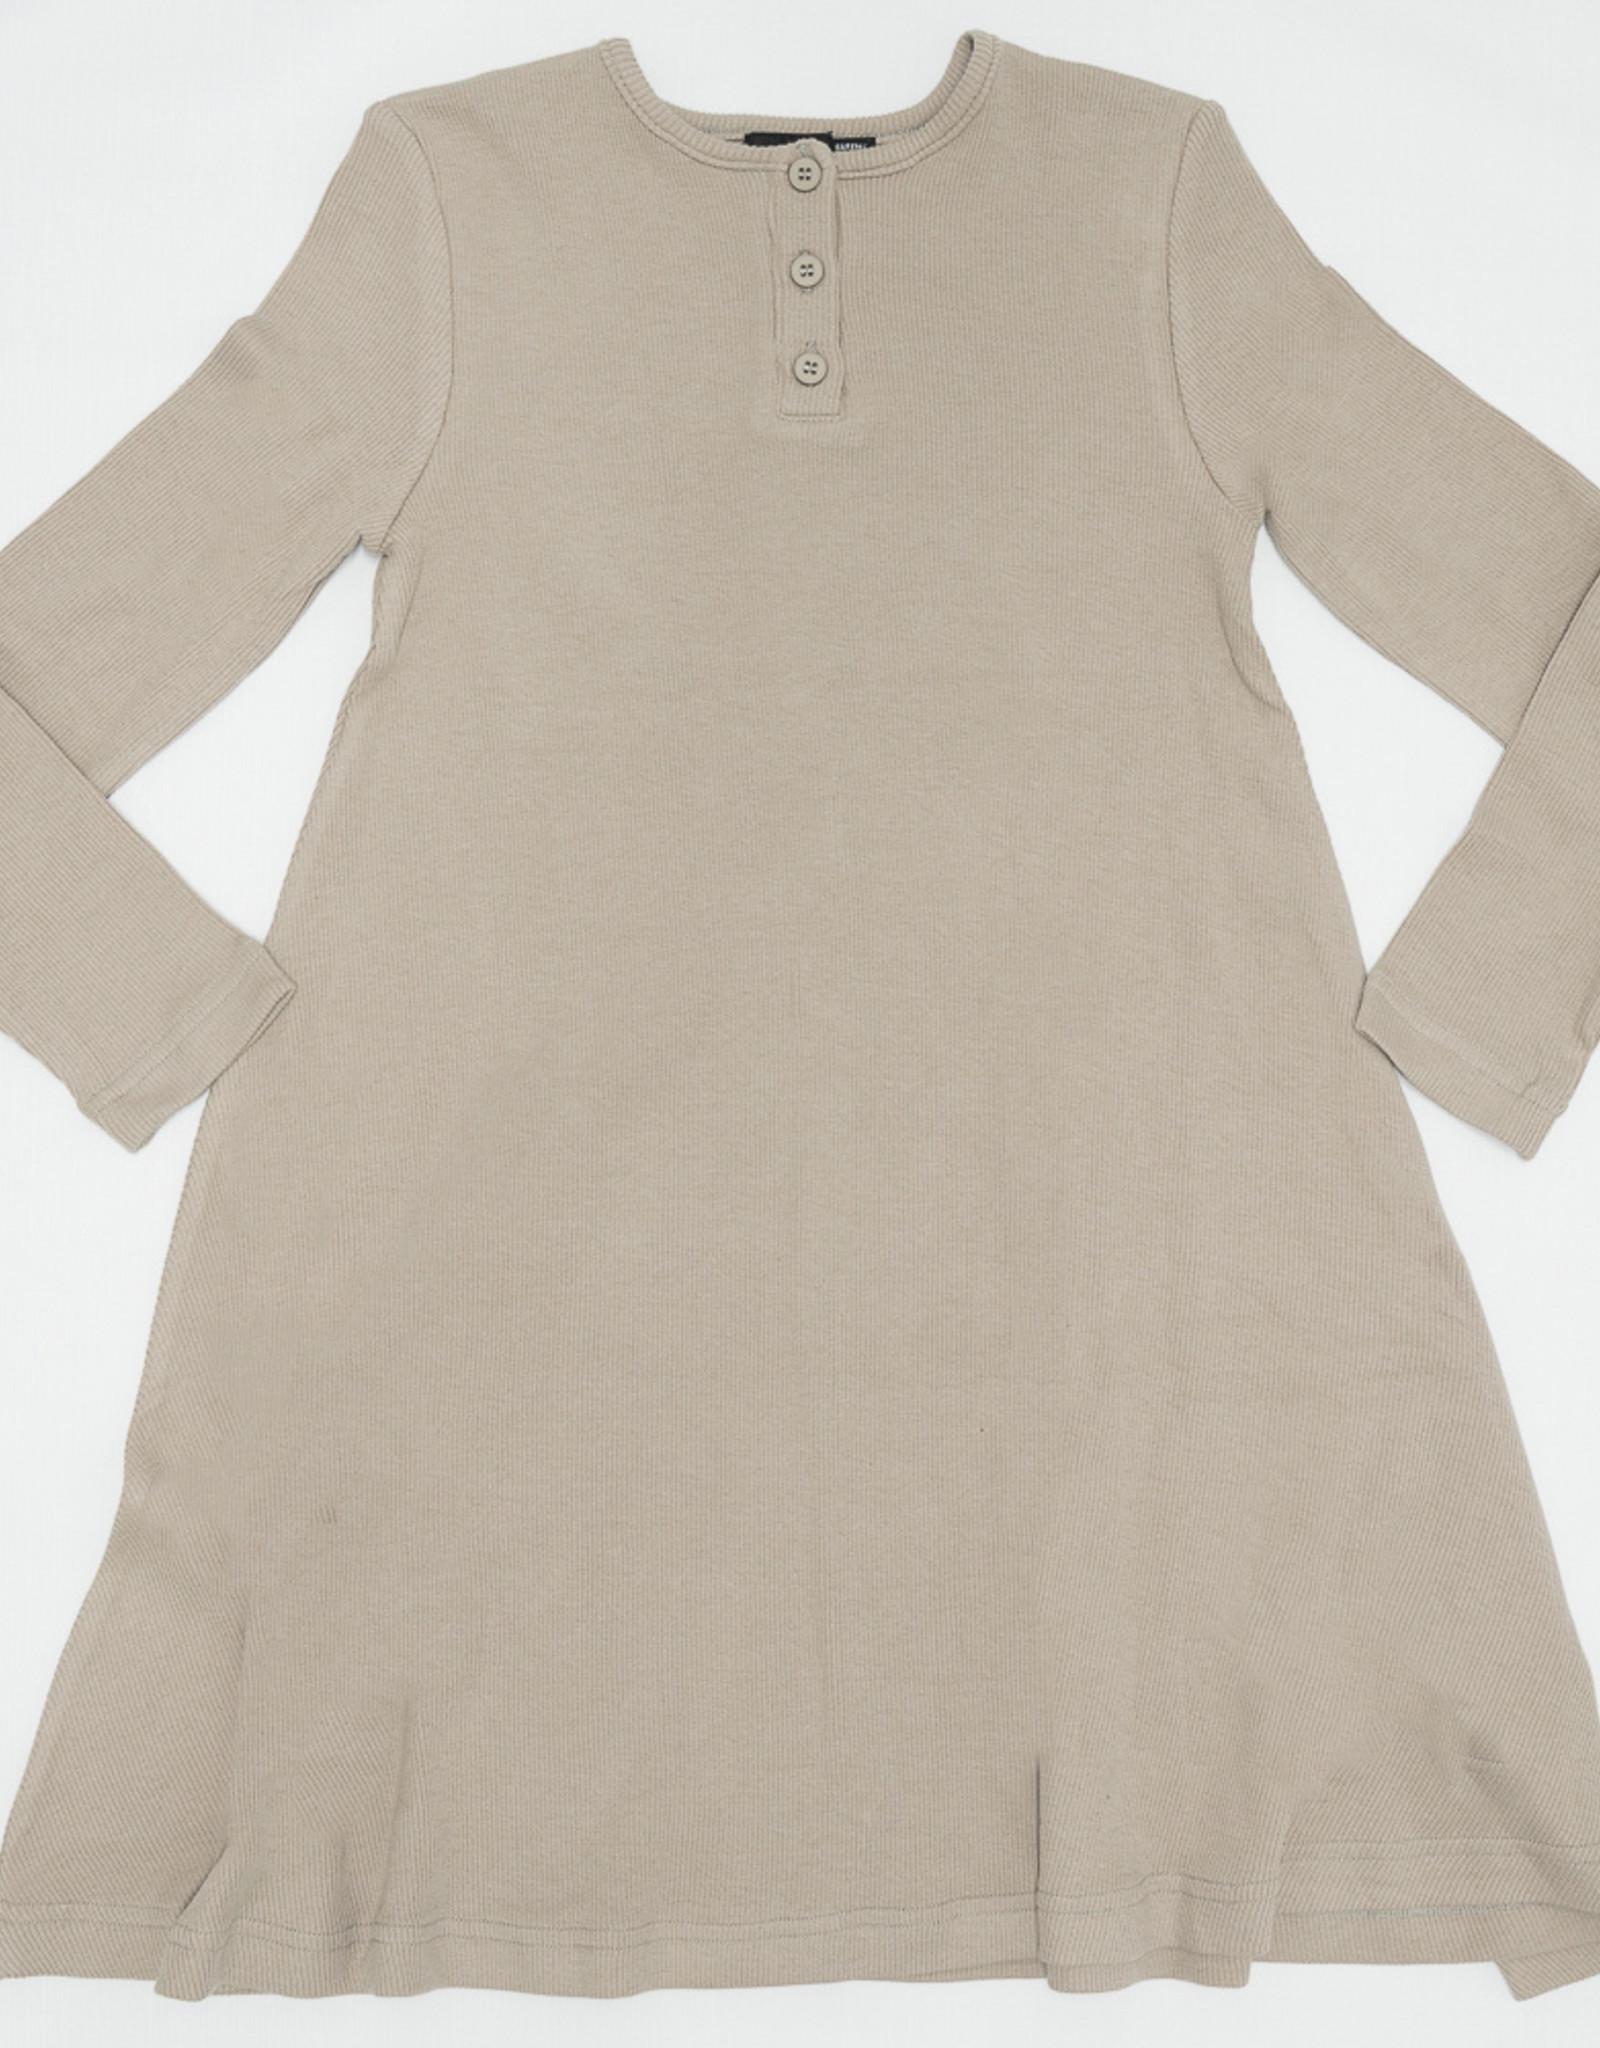 PeekABoo PeekABoo Soft Ribbed Dress